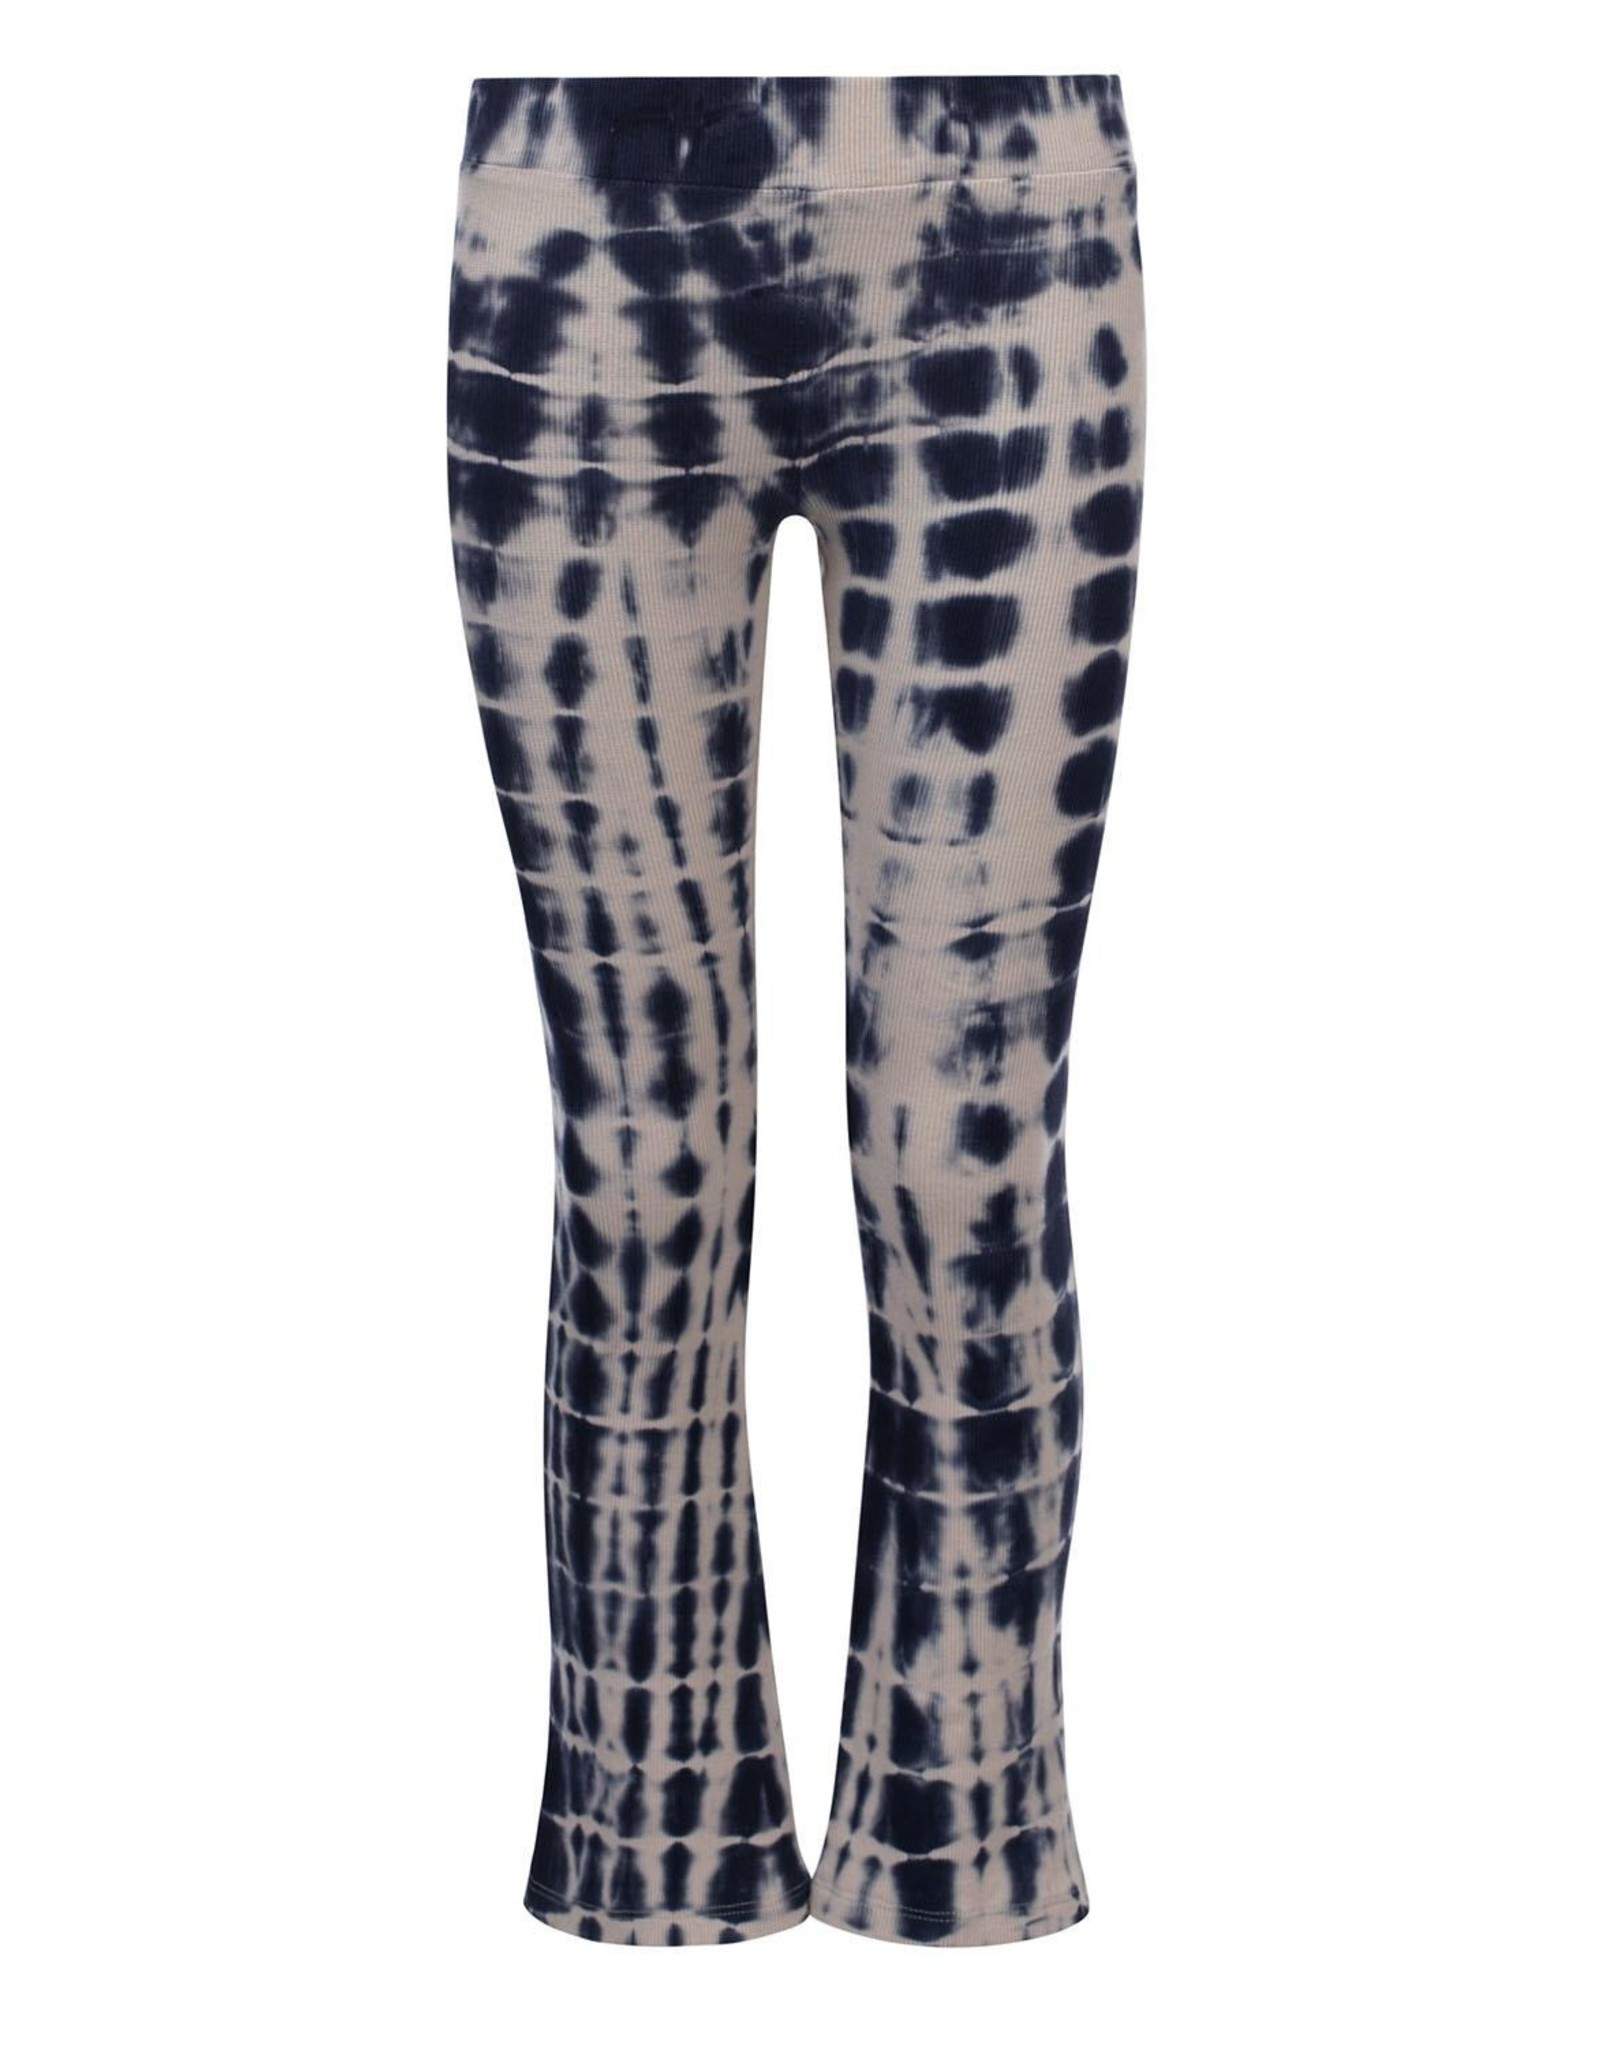 Looxs 10SIXTEEN 10Sixteen Rib Tie Dye Flare pants